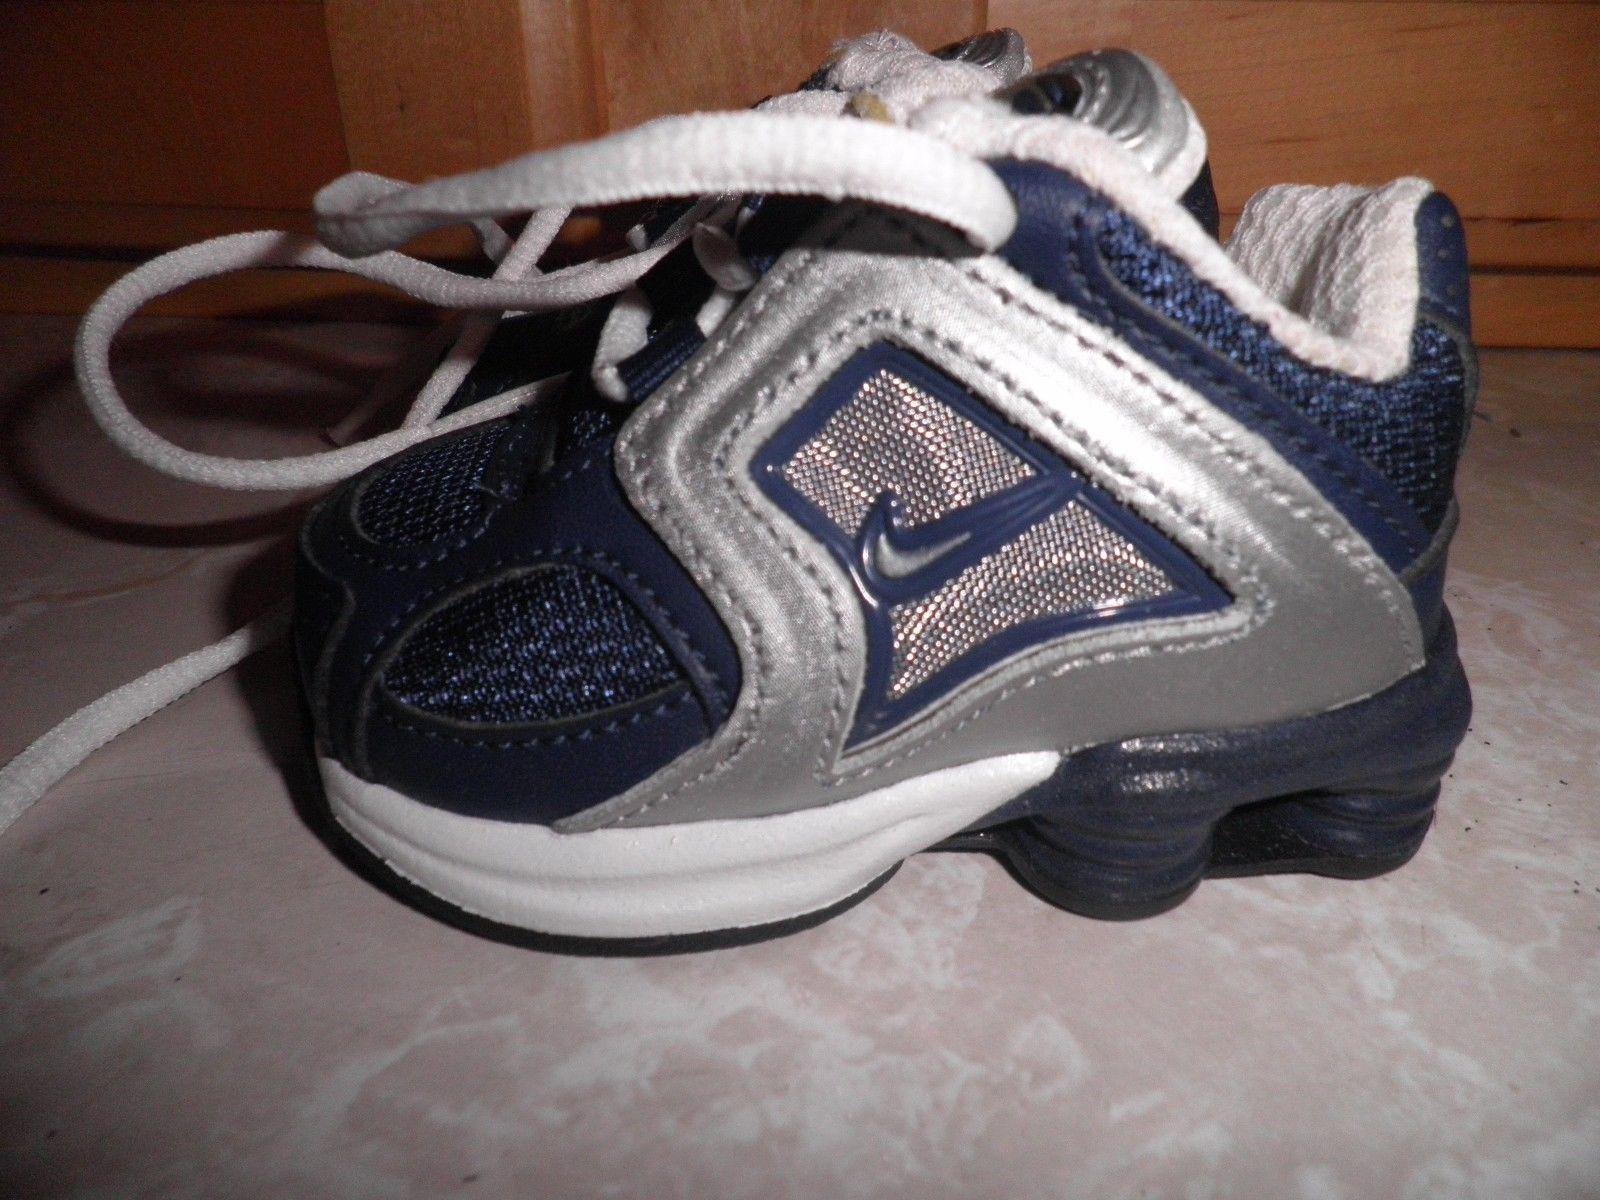 Nike Baby Shox Blue Silver Size 2c | eBay